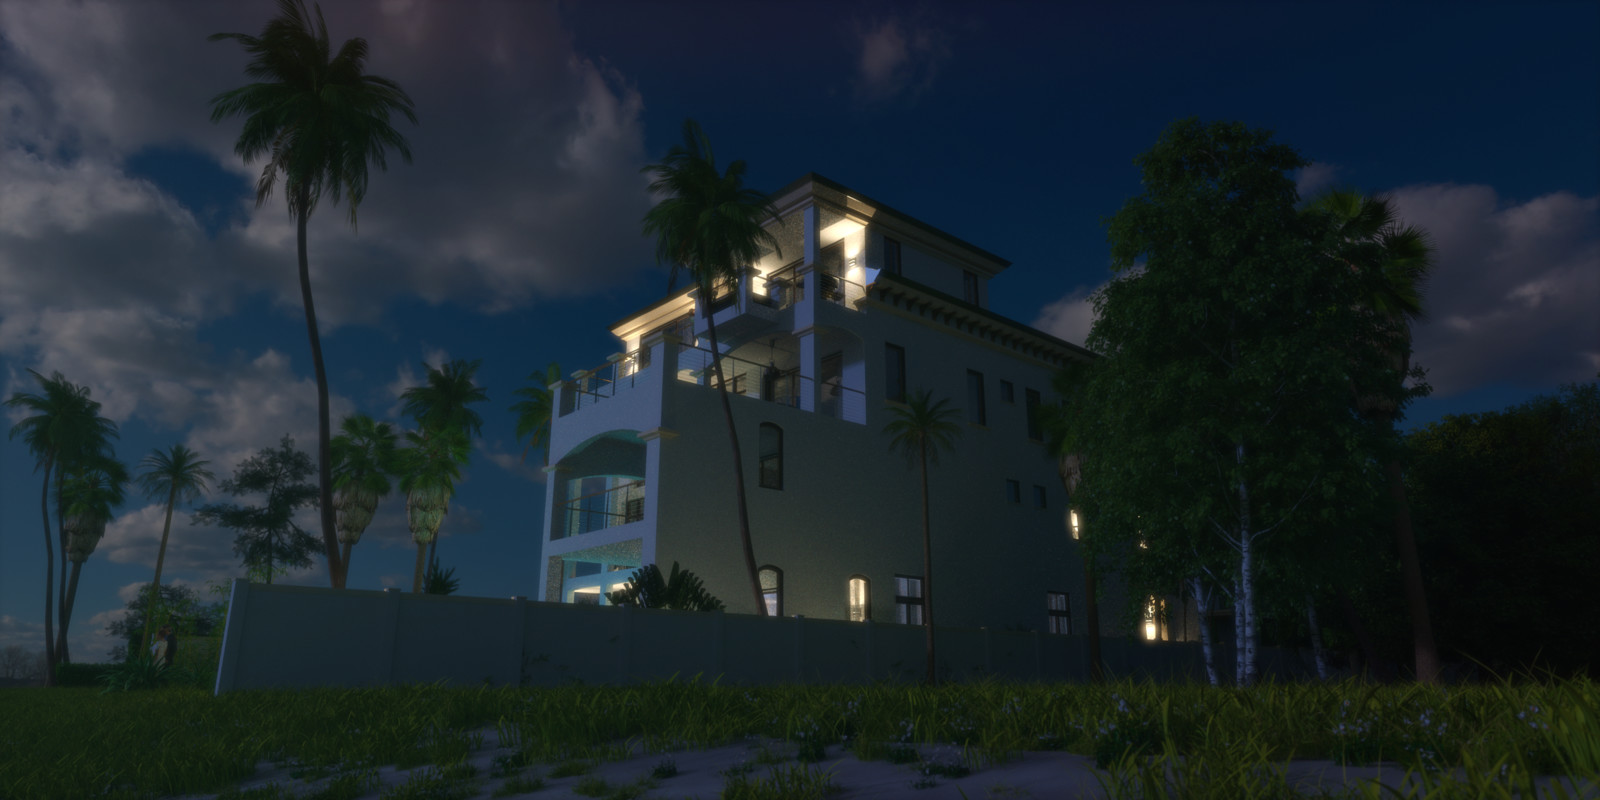 SketchUp + Thea Render  Seagrove Beach House: Scene 3 Night B Forward 2160 × 1080 Presto MC Bucket  HDR used (HQ version) by HDRI-SKIES http://hdri-skies.com/shop/hdri-sky-162/